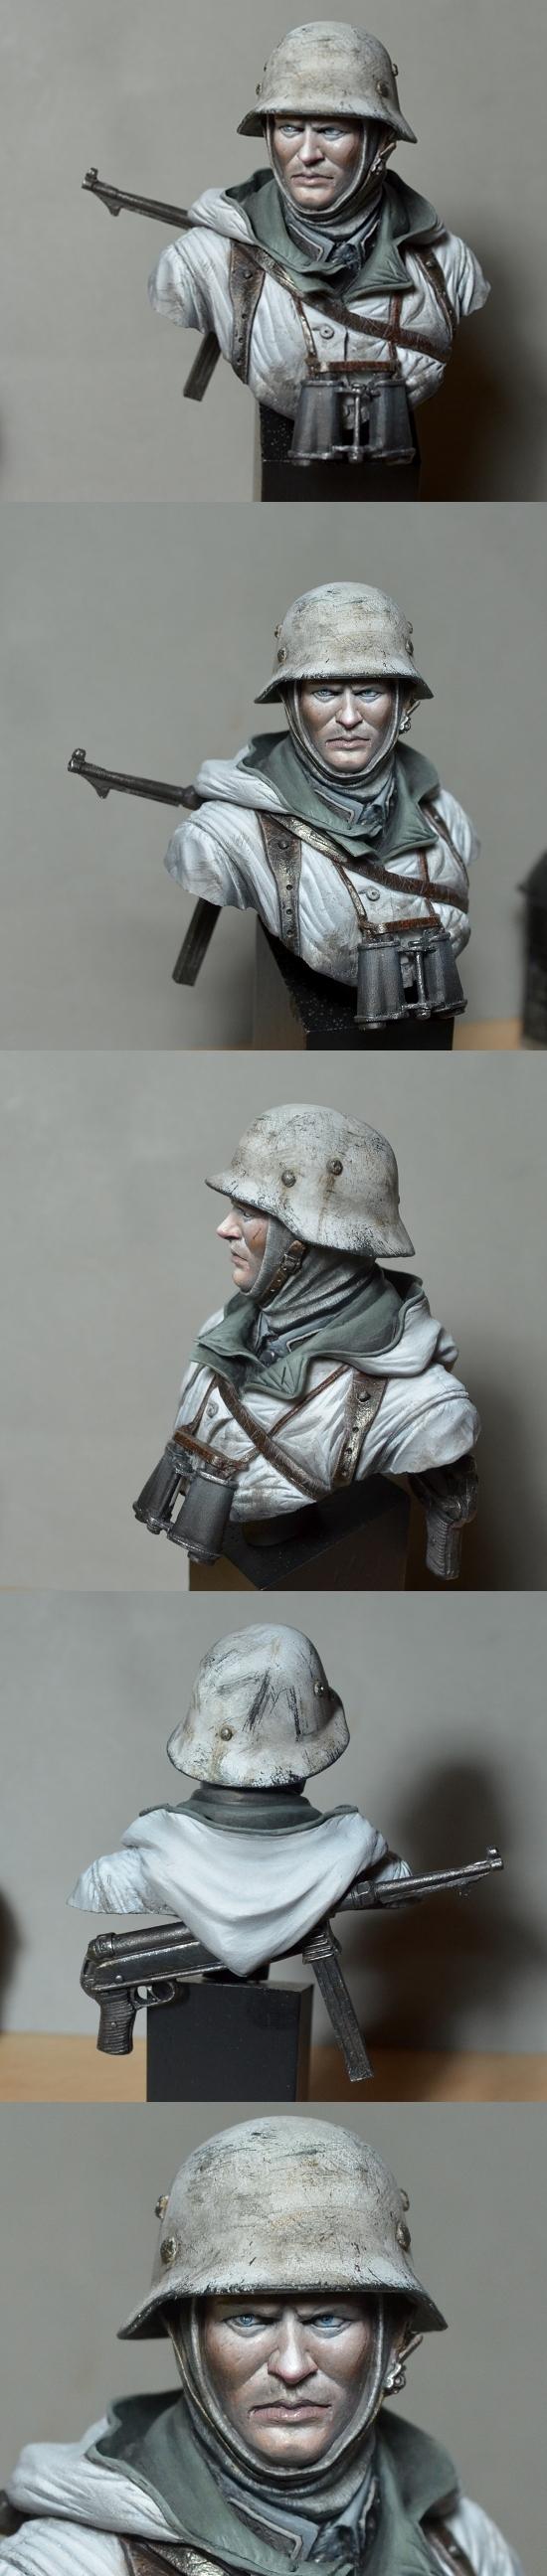 "Waffen SS 1942 par ""SK4TE"" Img4e22f31477bc3"